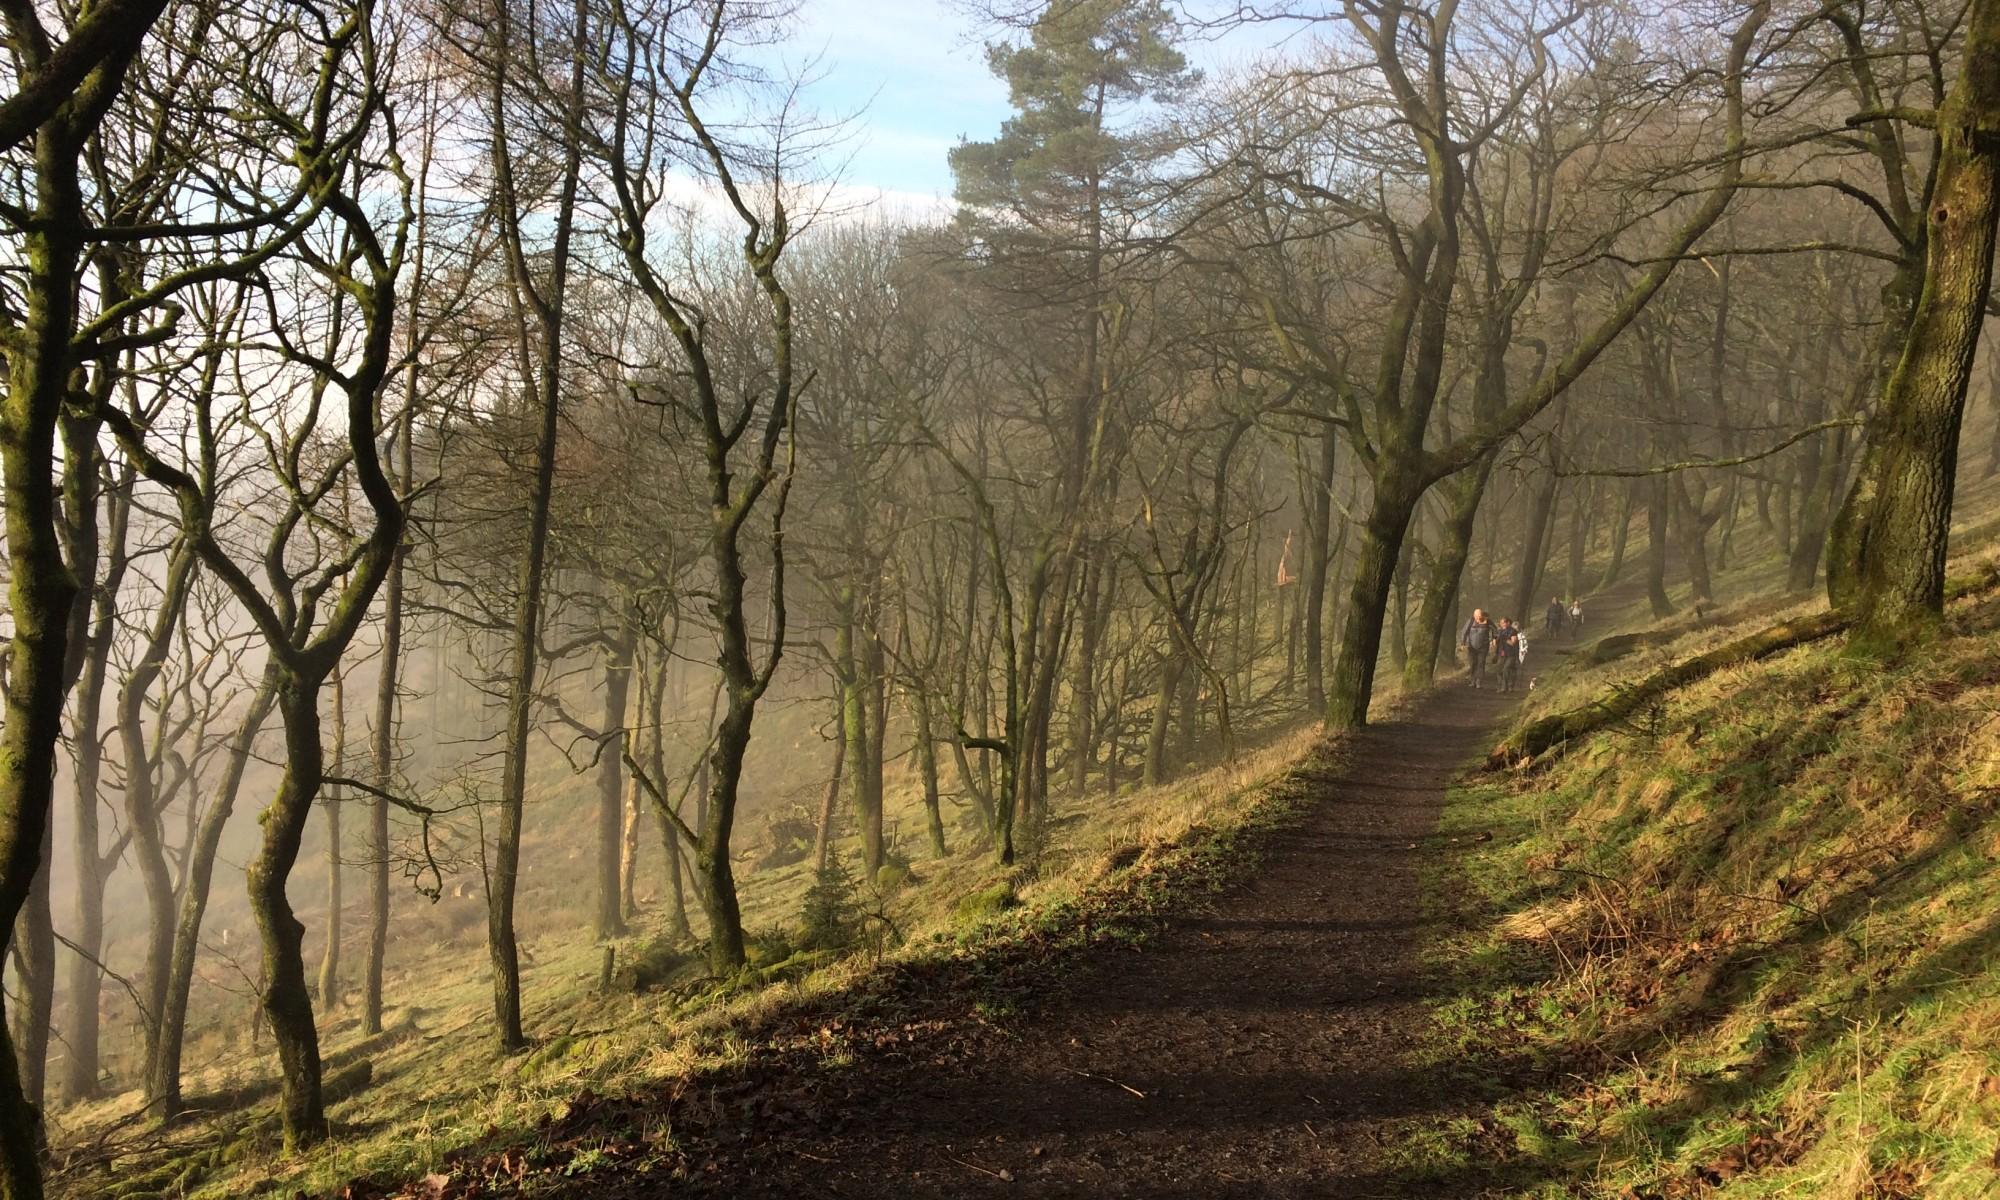 Nordic Walking Macclesfield Forest